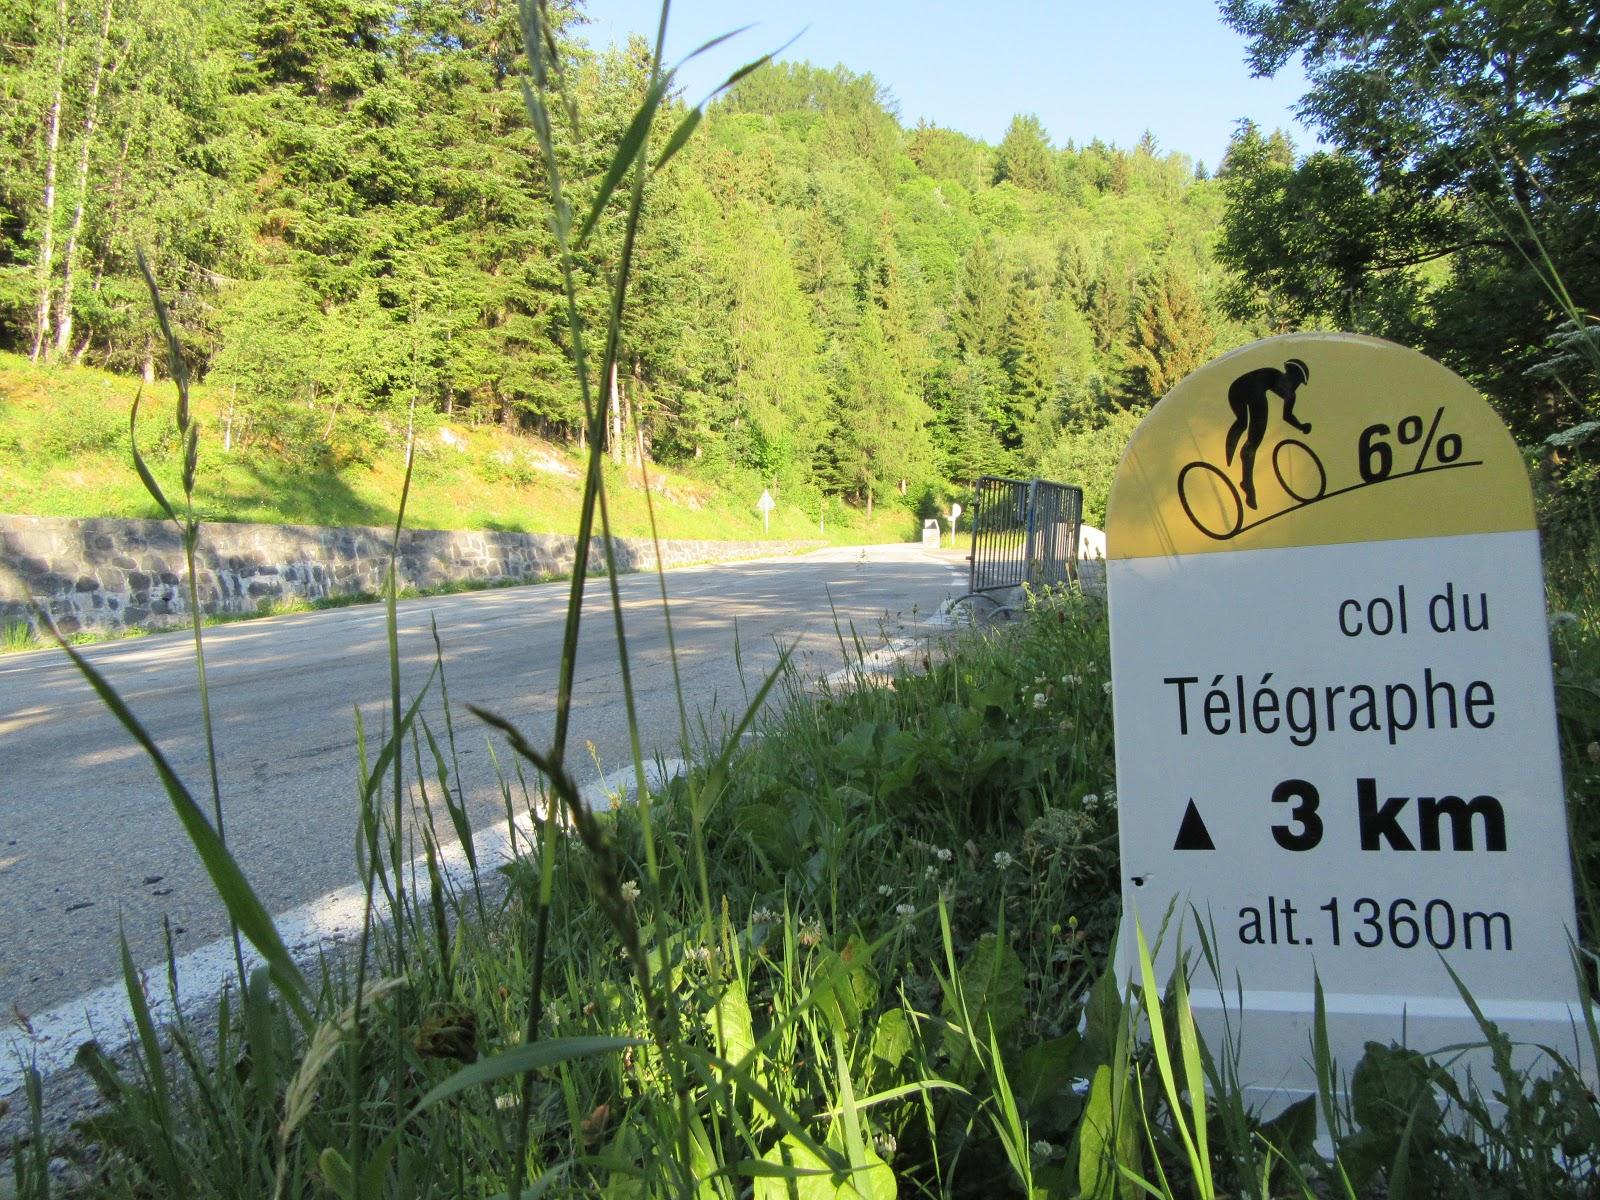 Climbing Col du Telegraphe and Col du Galibier by bike - km marker for Col du Telegraphe